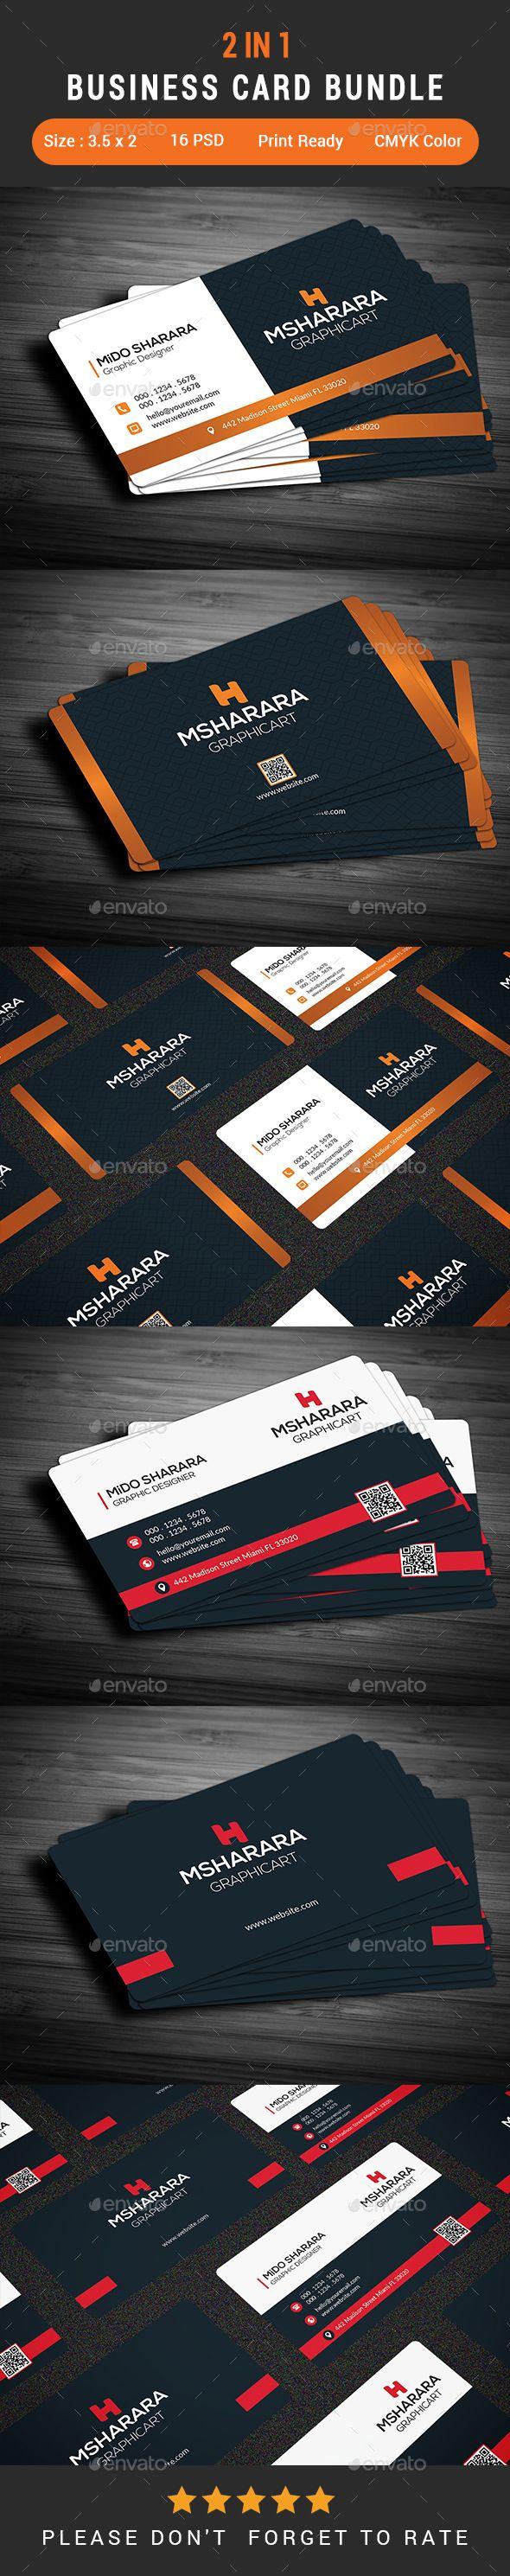 3601 best Business Card images on Pinterest | Font logo, Print ...